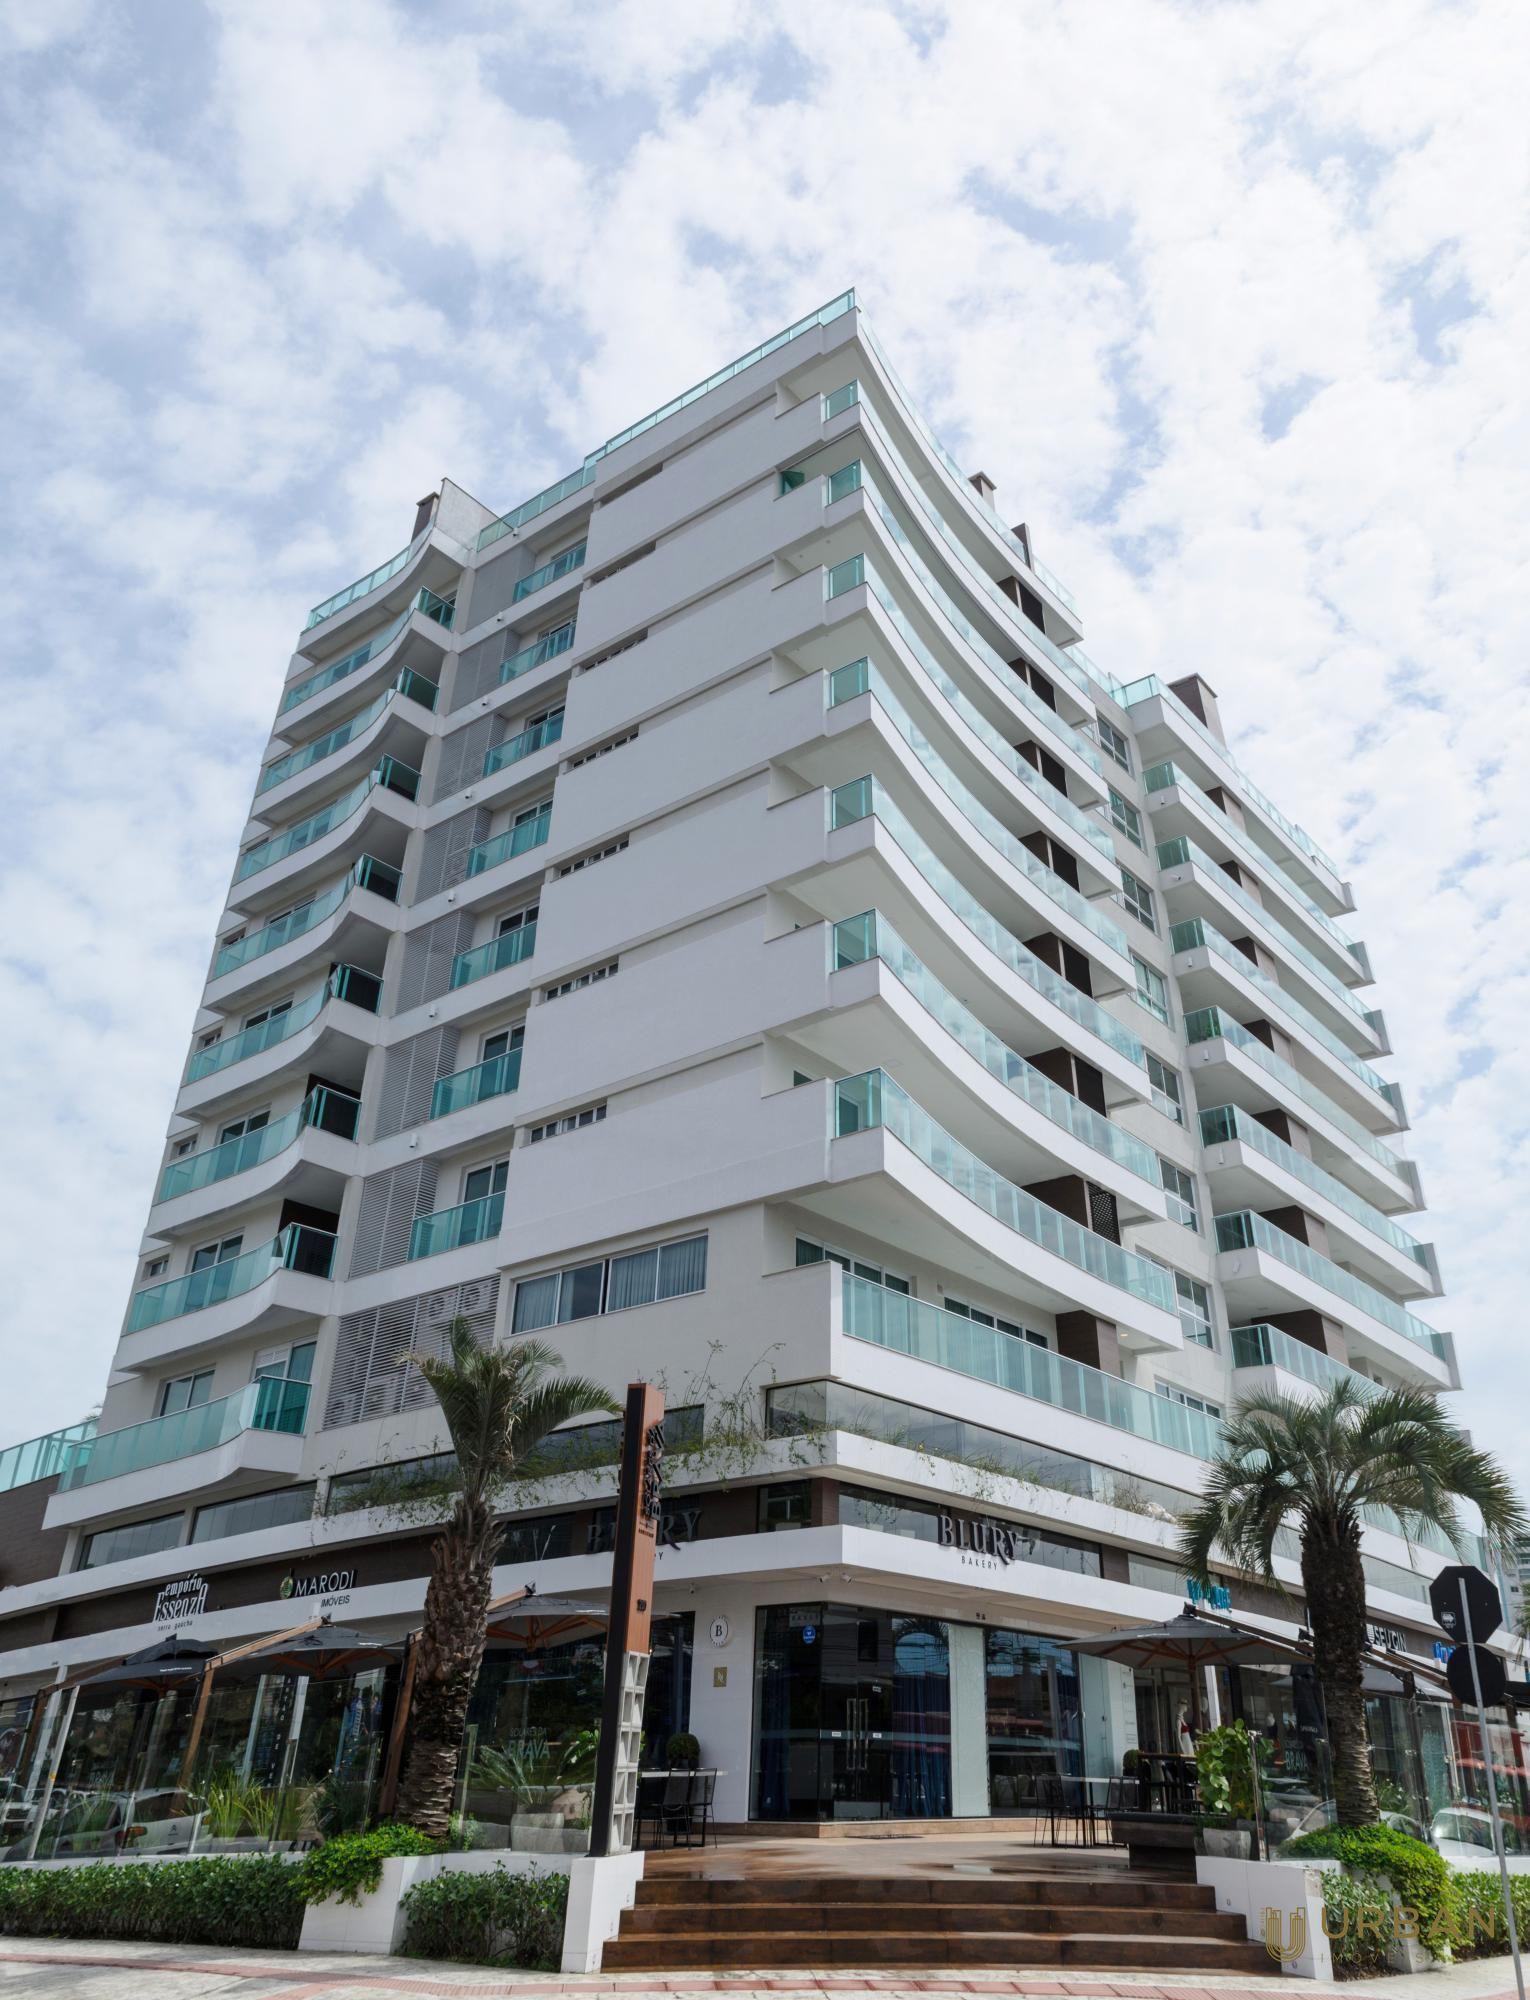 Cobertura à venda  no Praia Brava de Itajaí - Itajaí, SC. Imóveis